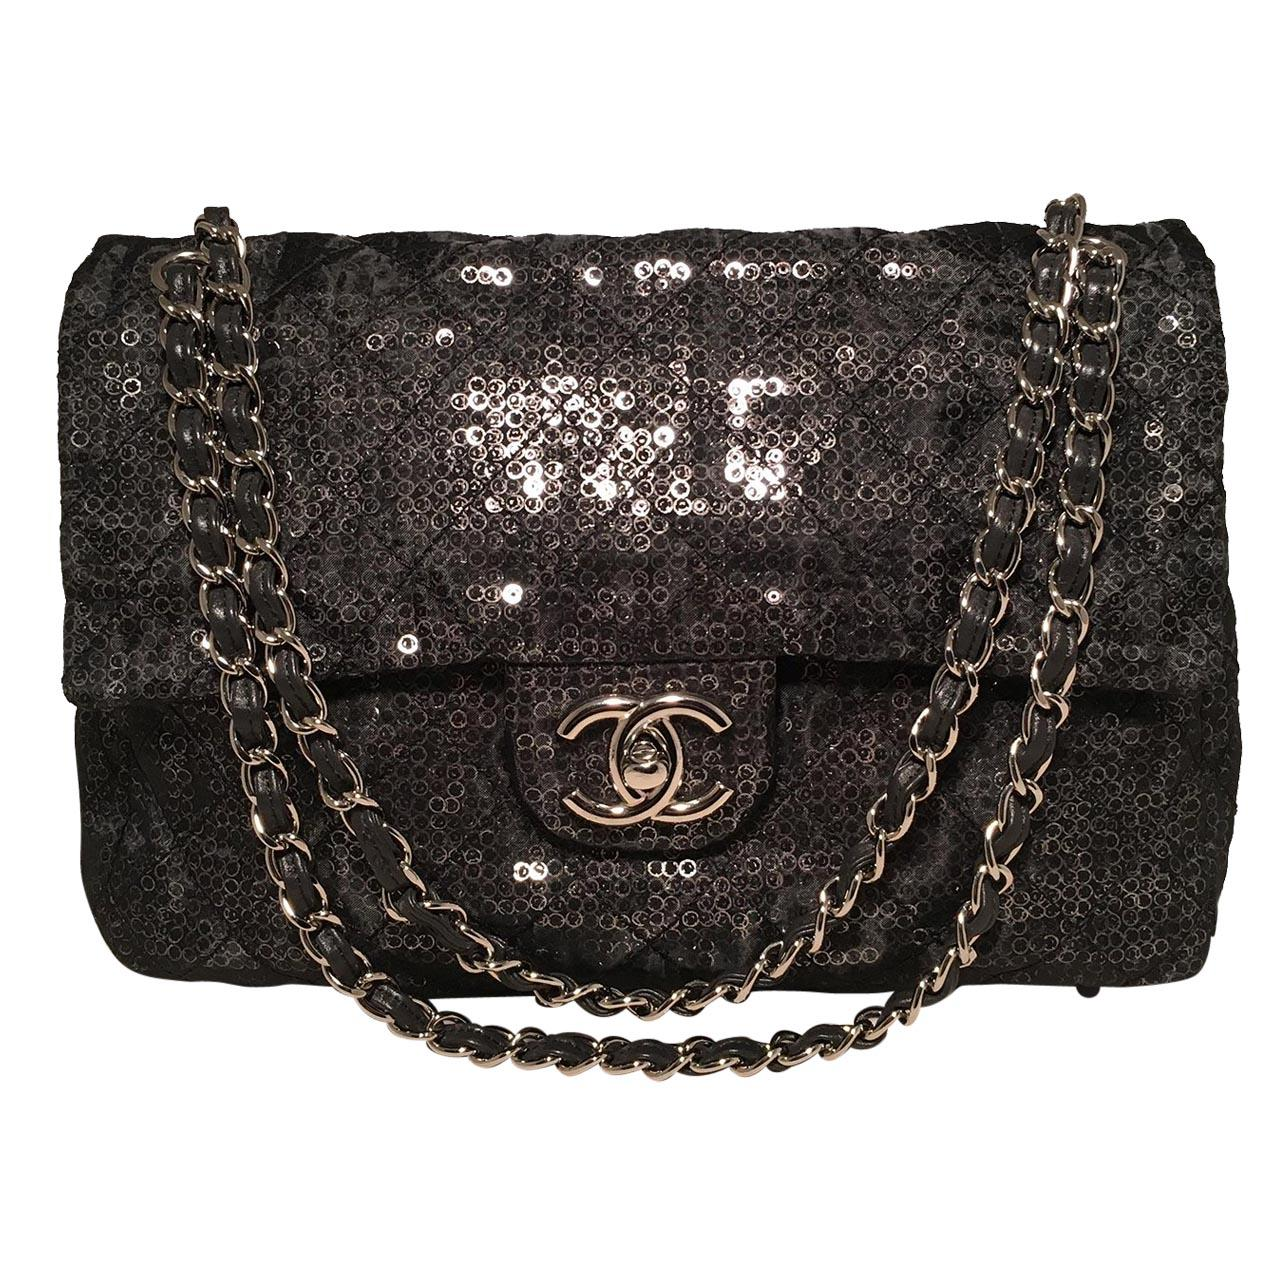 Chanel Hidden Sequins Mesh Jumbo Classic Flap Shoulder Bag